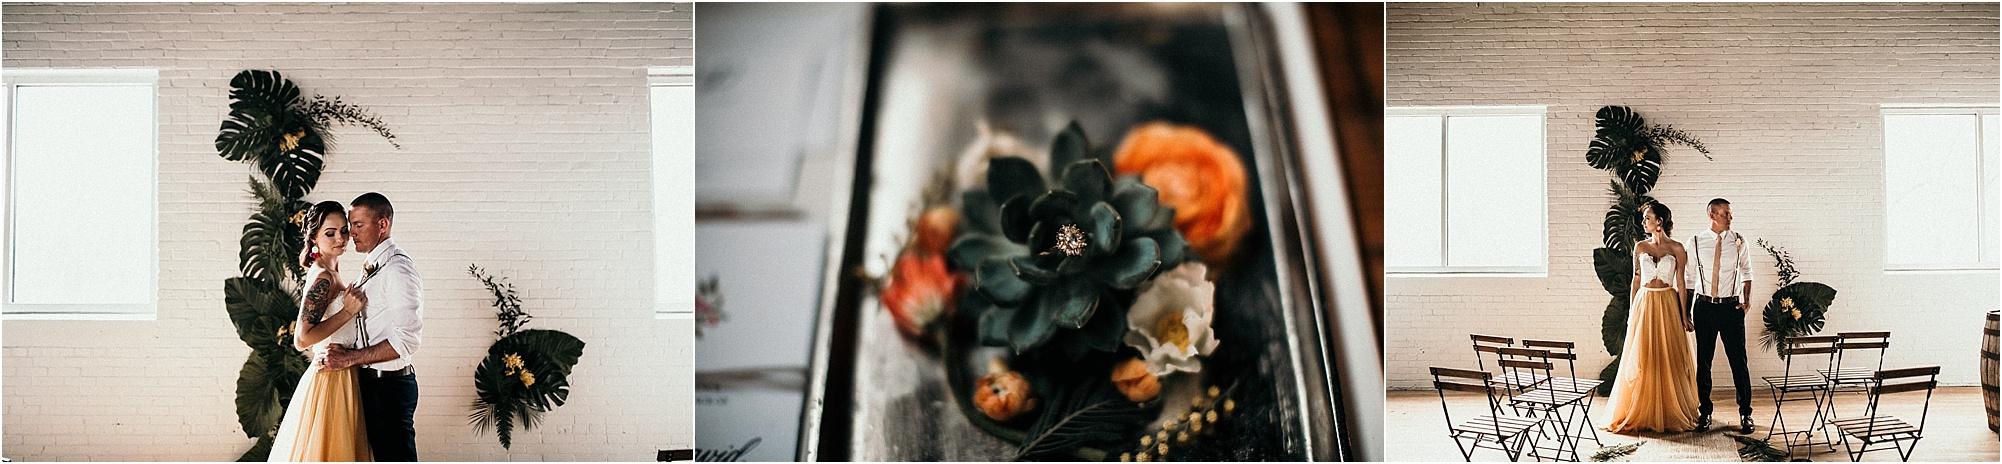 Old-South-Vintage-Rentals-Bride-avonne-photography_0013.jpg